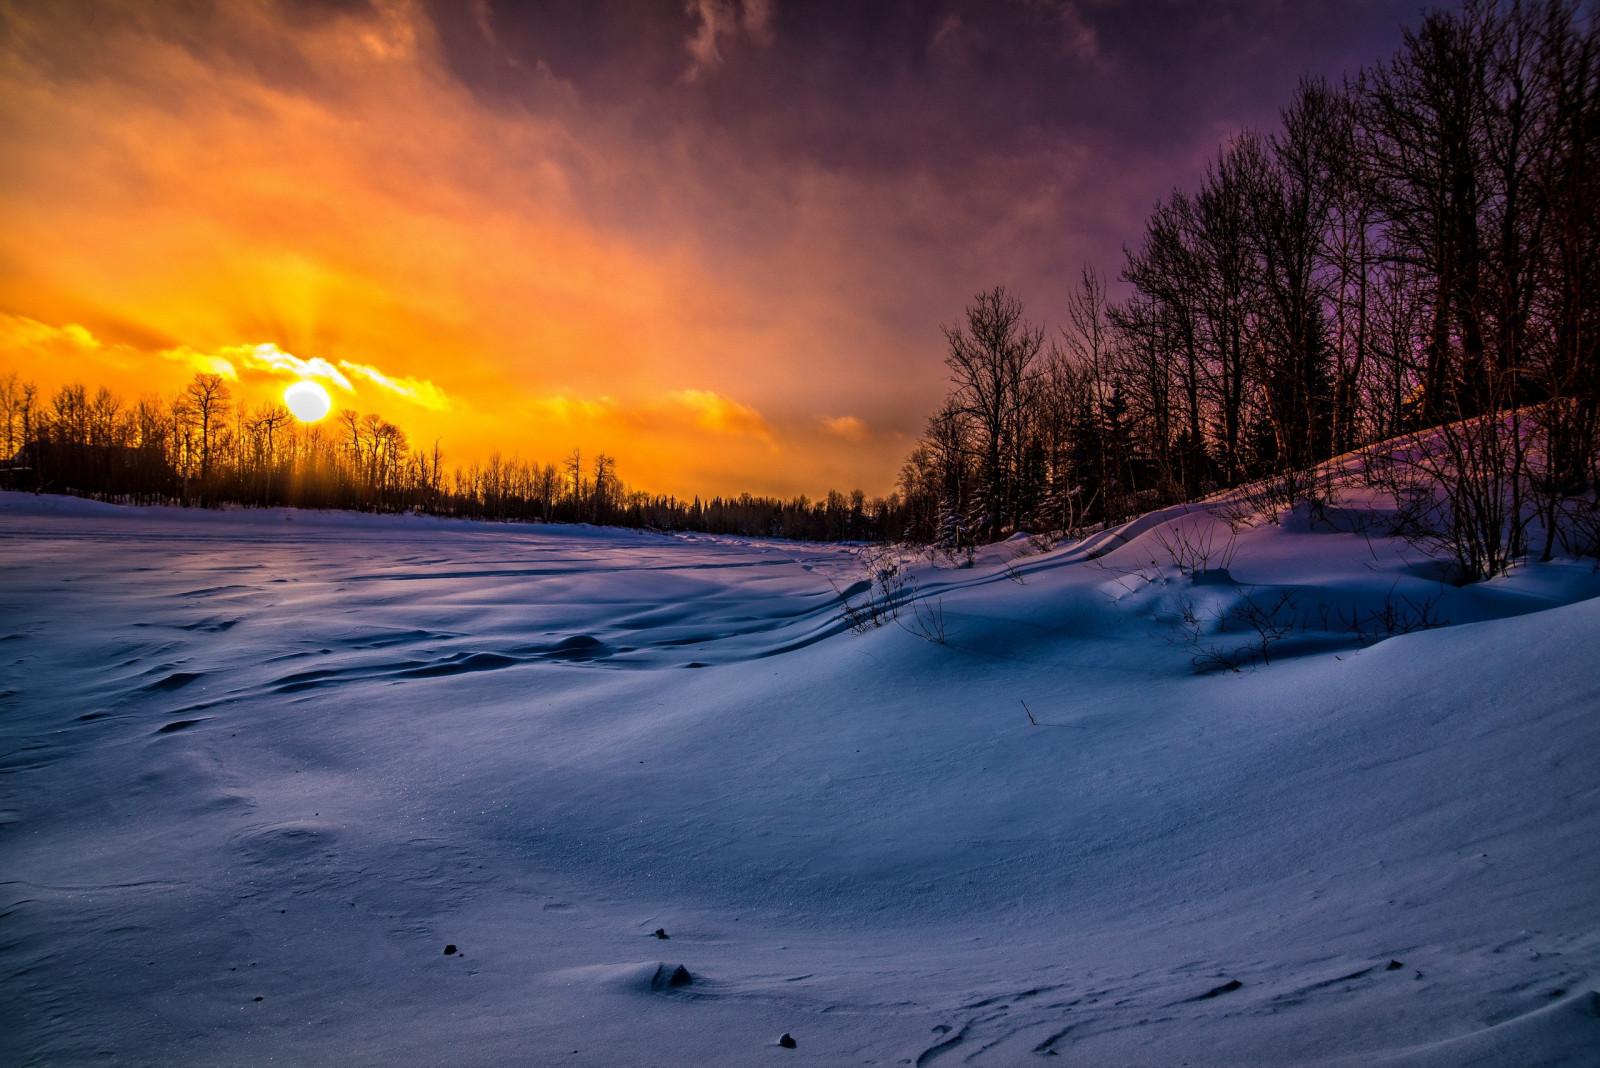 упускают красивая картинка с закатом солнца зима храма